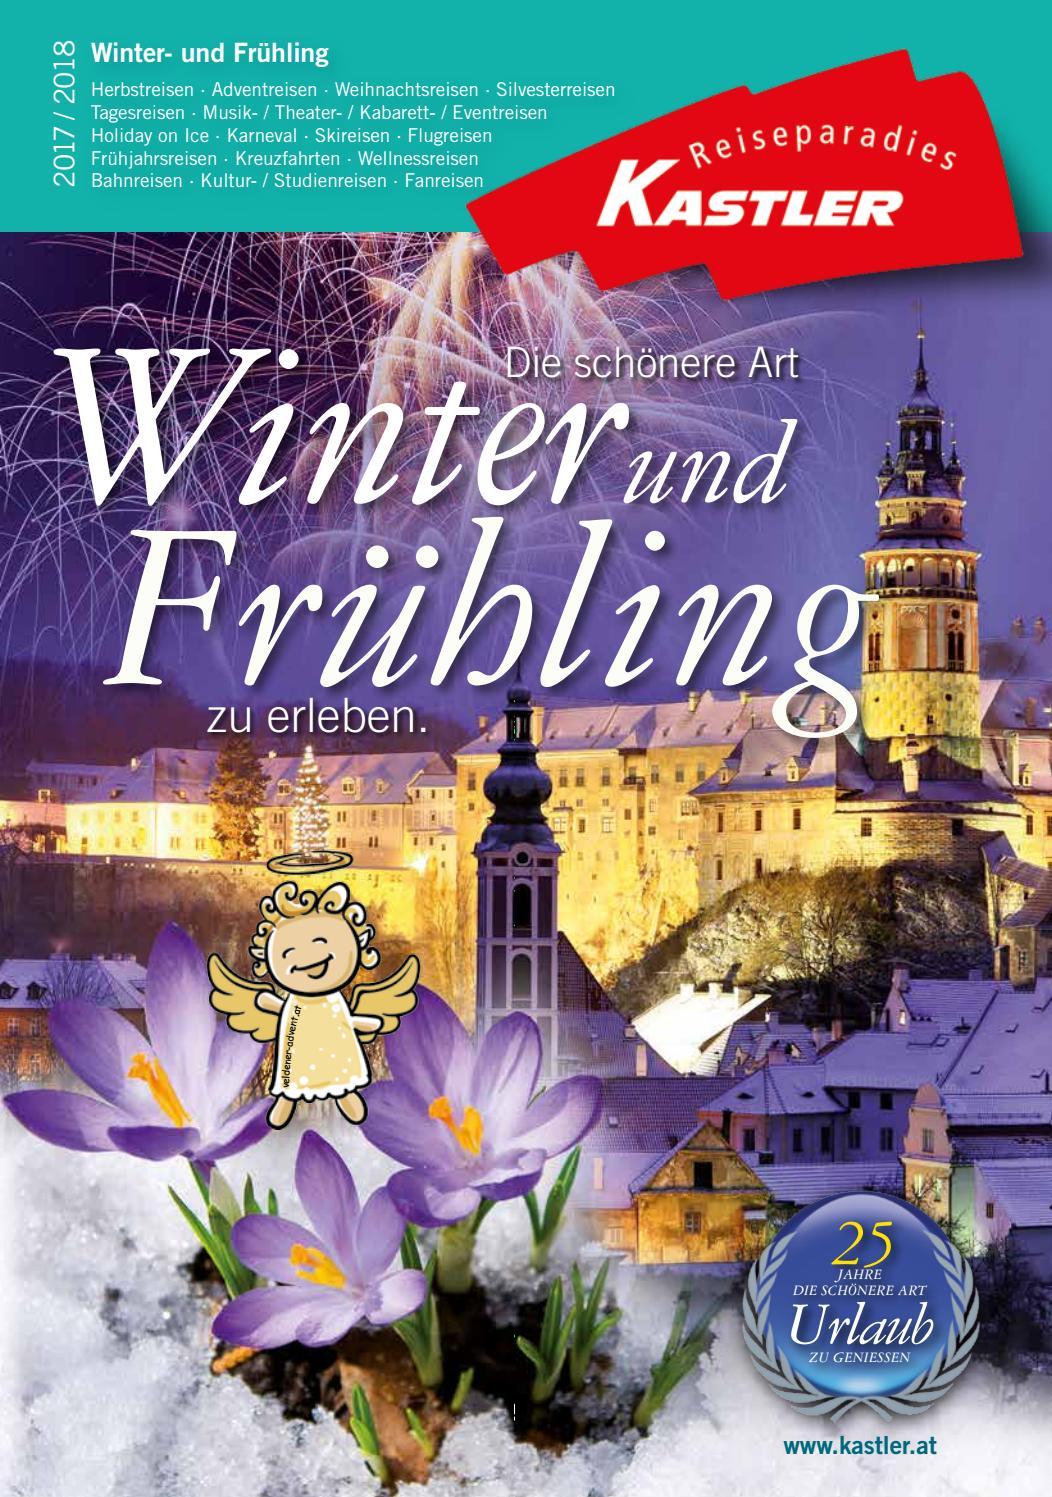 Katalog Winter und Frühling 2017 / 2018 by Reiseparadies Kastler - issuu